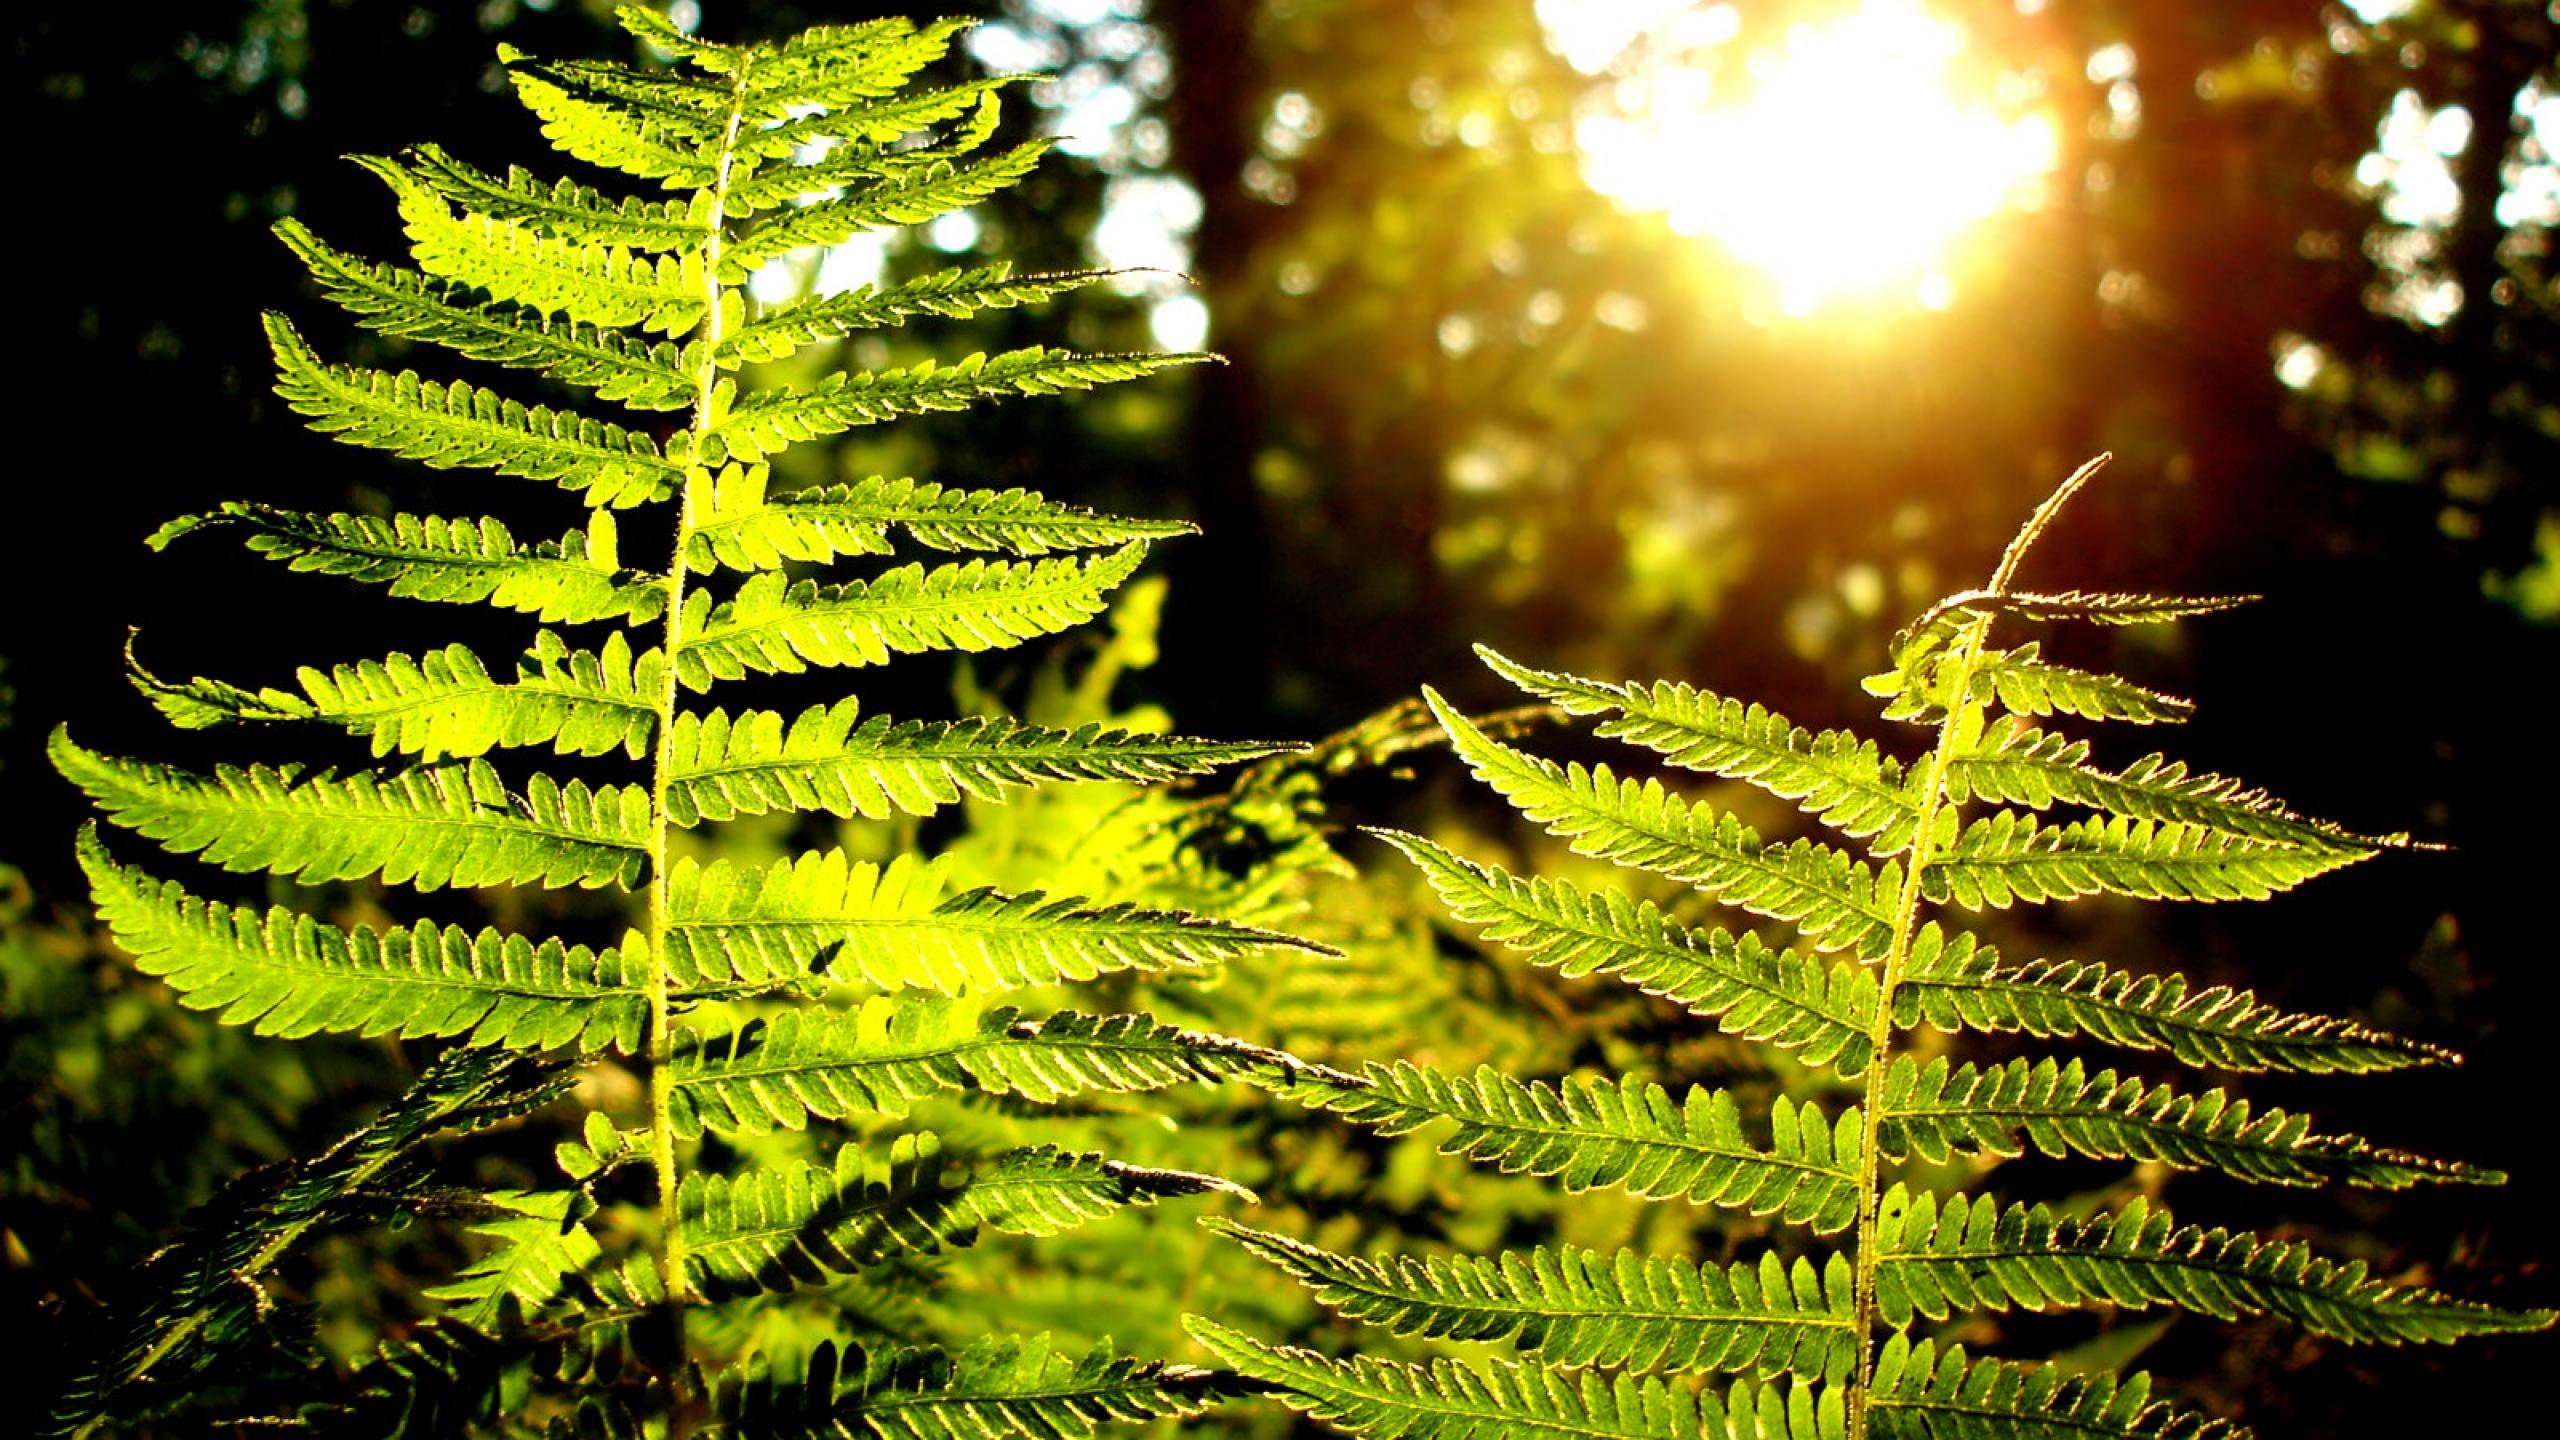 fern plant hd wallpaper background 51845